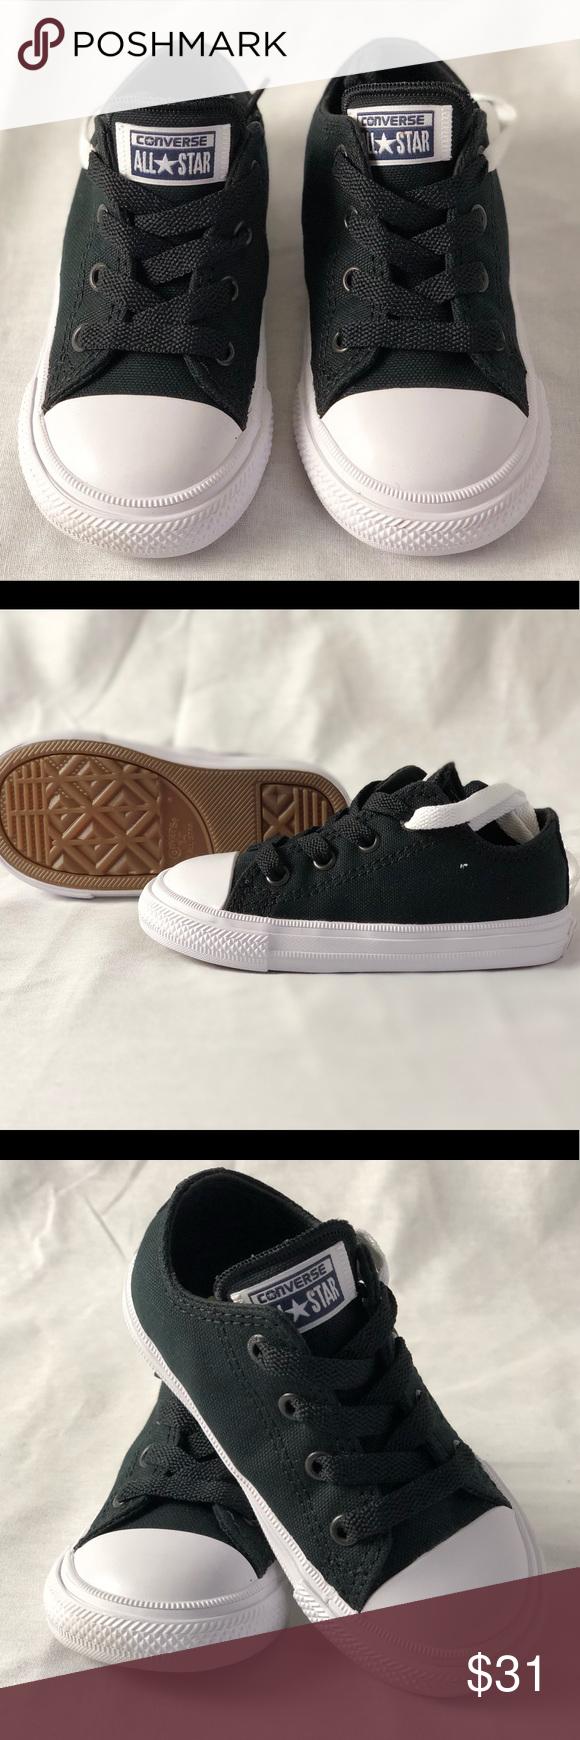 184eb74b949 CONVERSE Infant CTAS II OX Black White Navy Size 7 CONVERSE Infant Chuck  Taulor 2 AII OX Trainers Kids Shoes. Black White Navy Size 7 Converse Shoes  ...